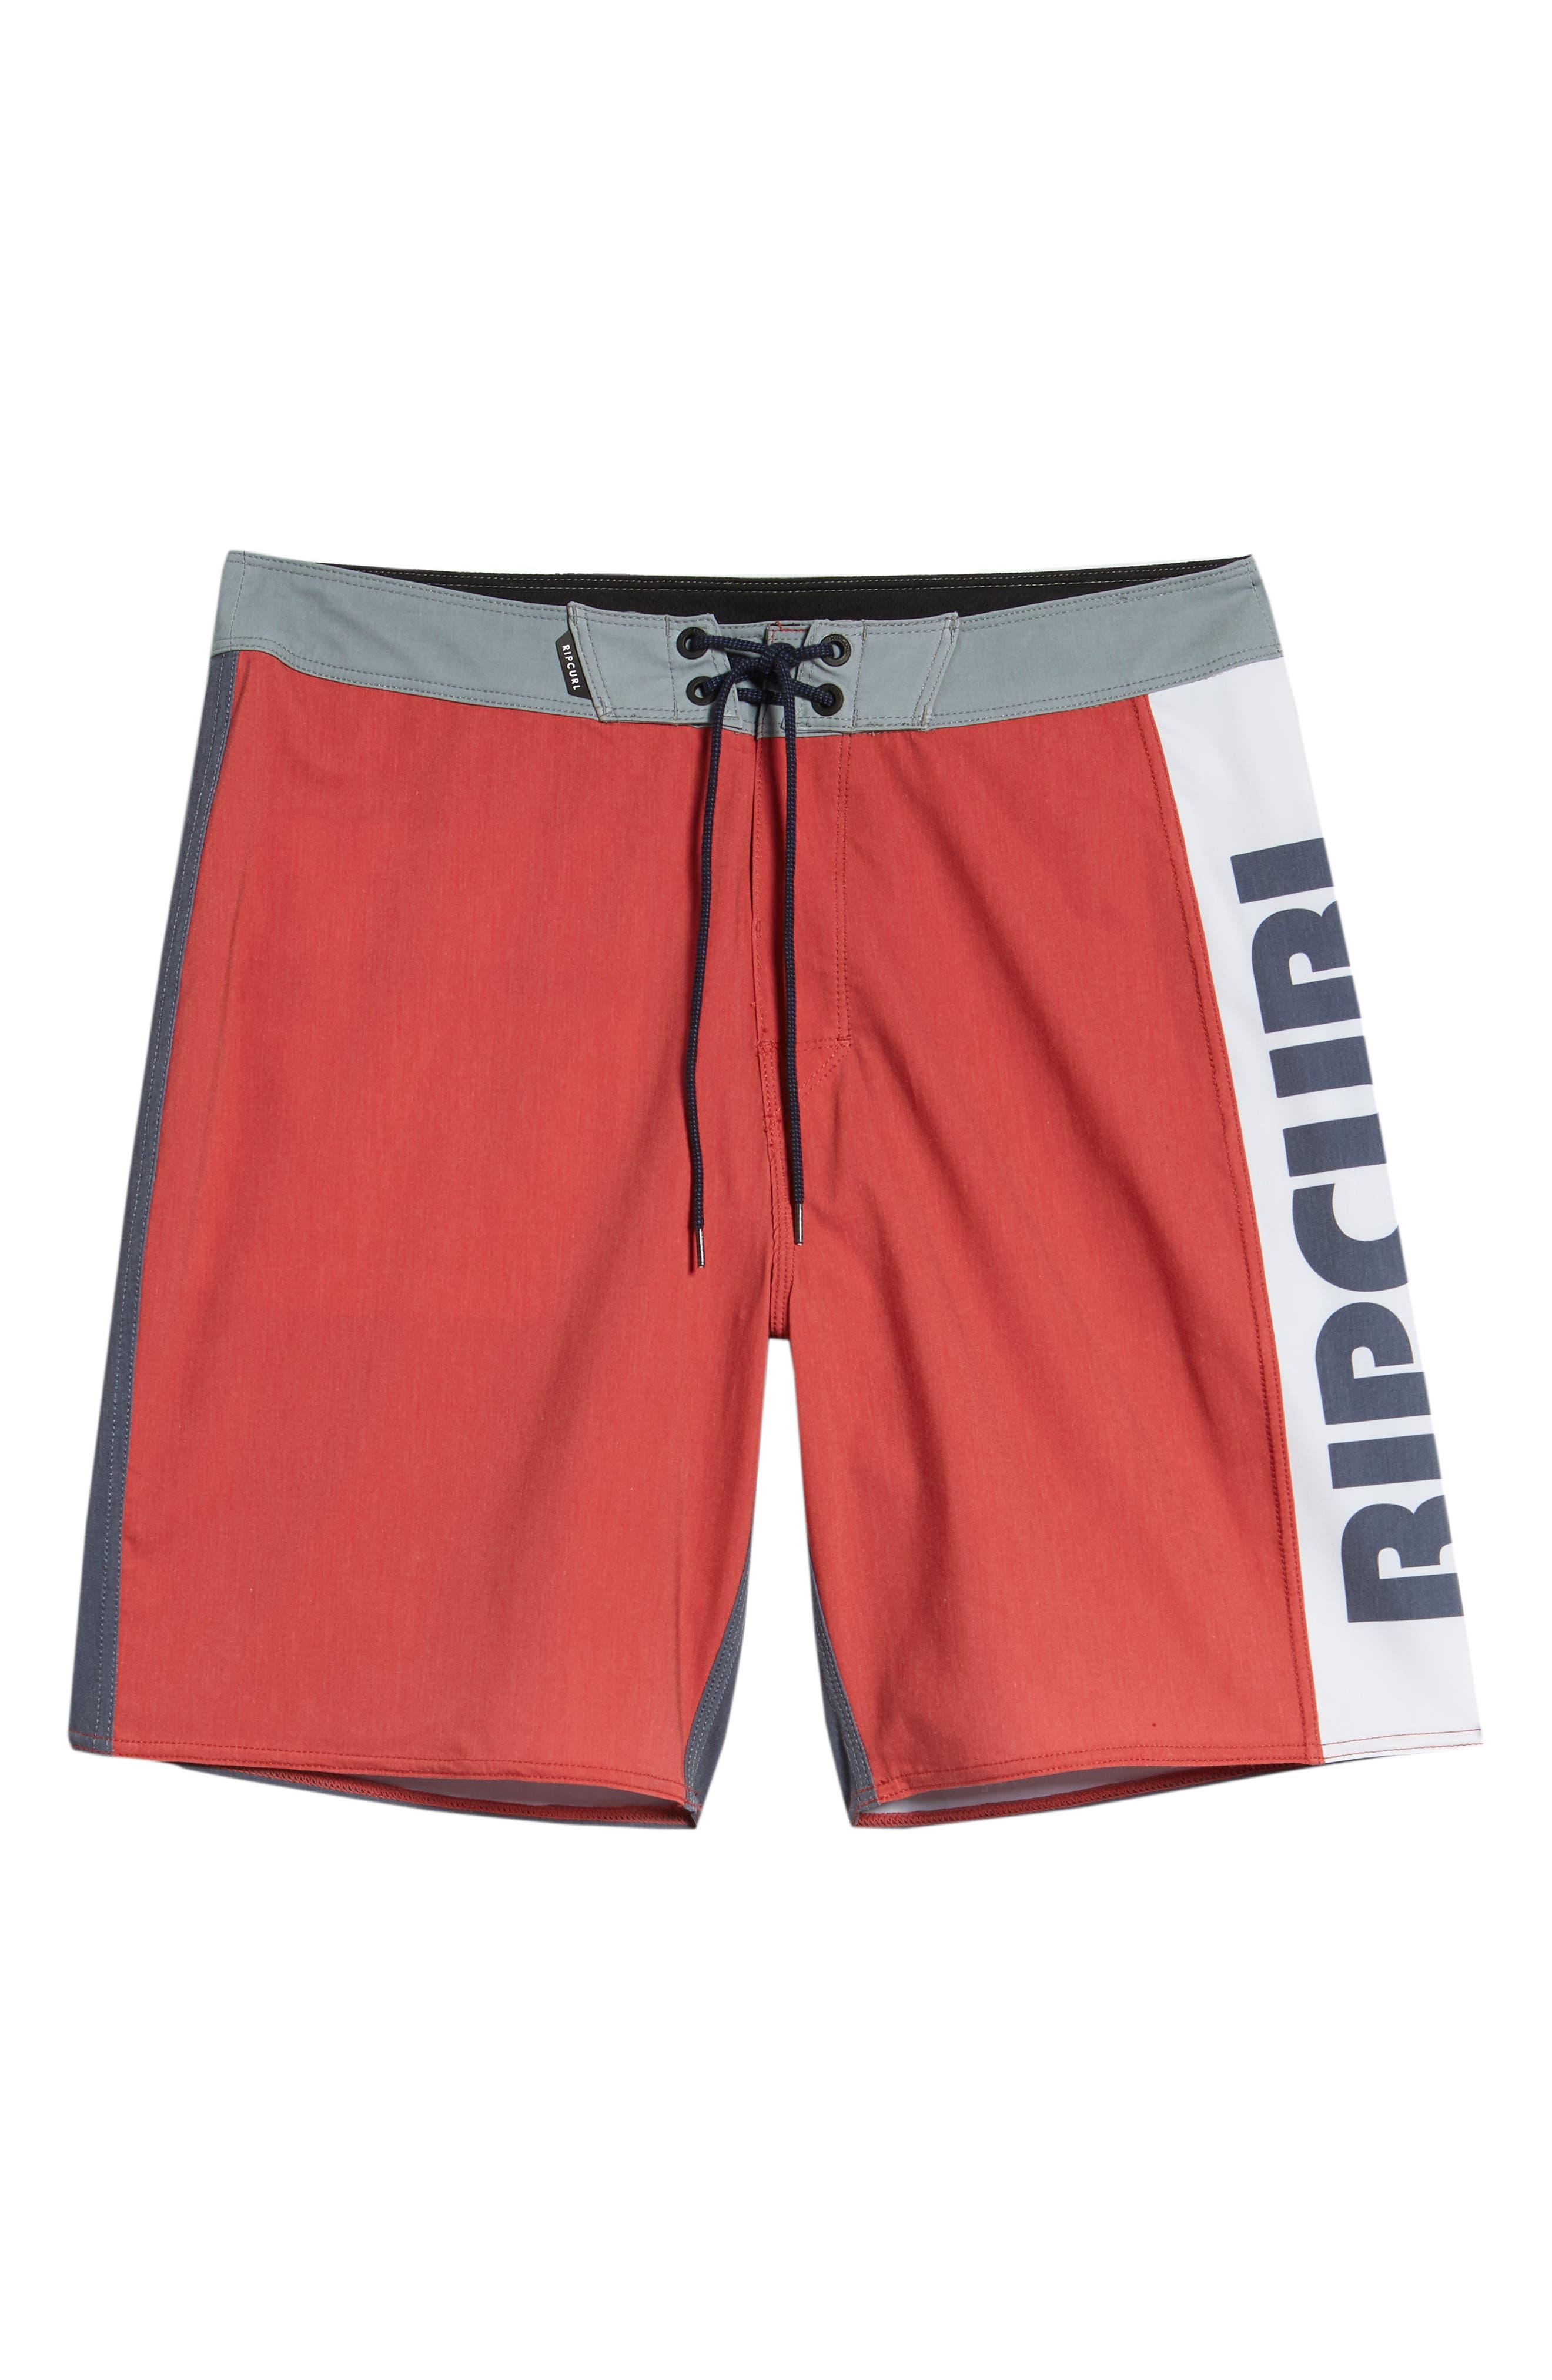 Mirage Owen Stretch Board Shorts,                             Alternate thumbnail 6, color,                             600